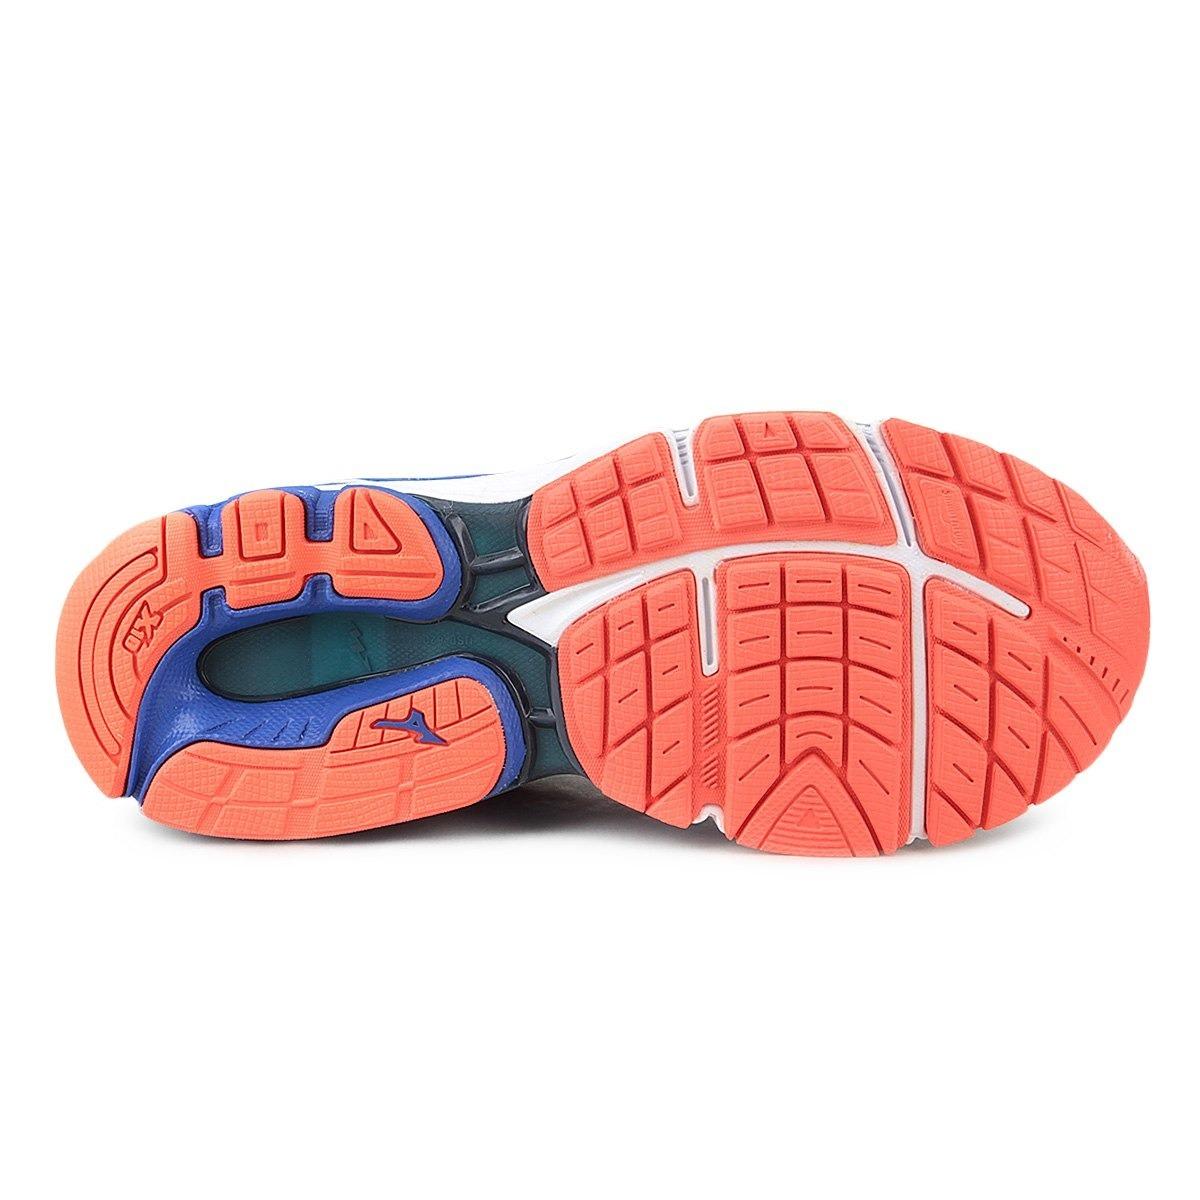 9221efe437c26 Tênis Mizuno Wave Prime 12 - R  350